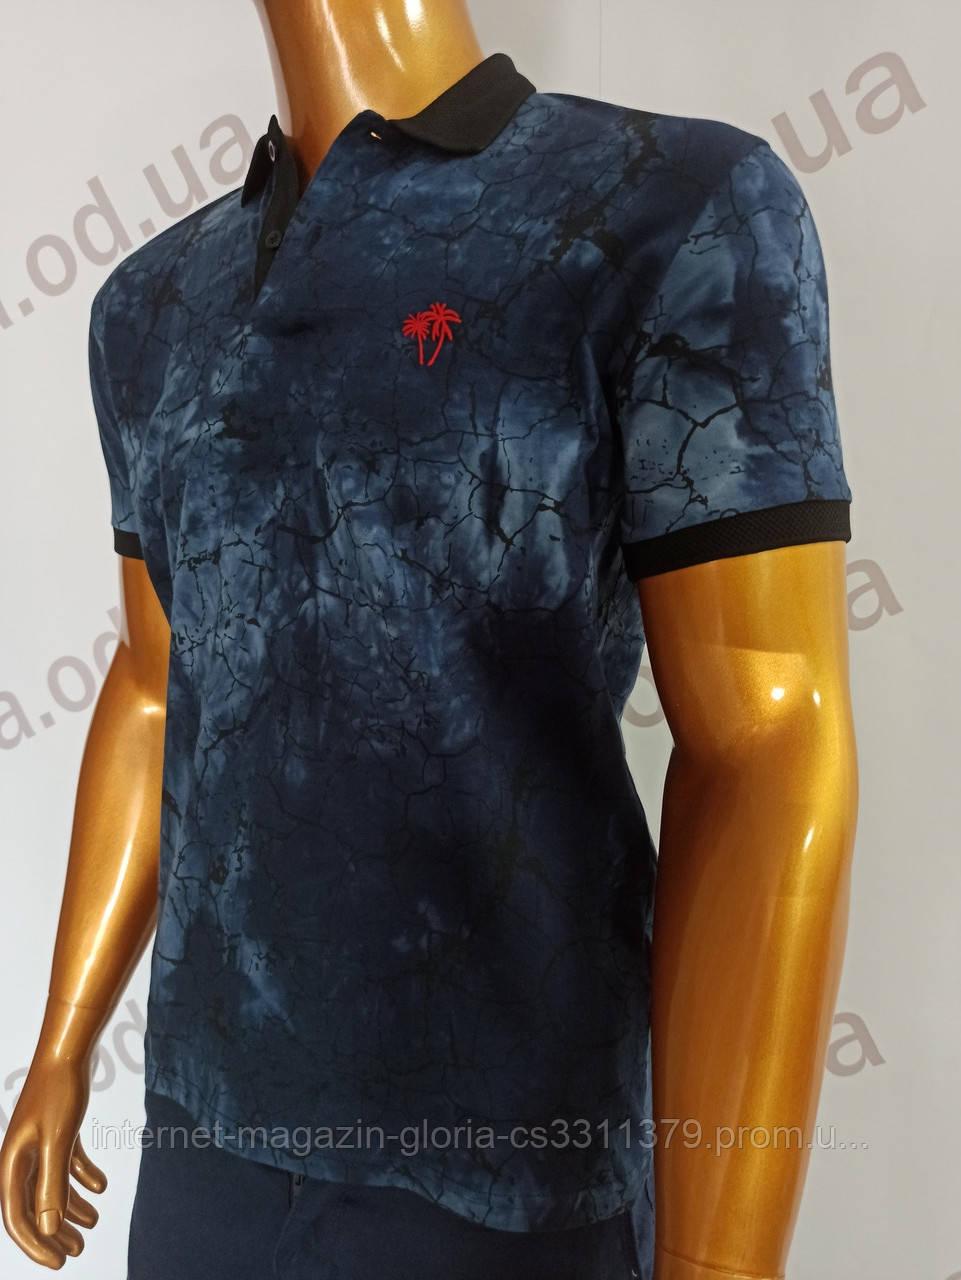 Мужская футболка поло MSY. 11232-8334(si). Размеры: M,L,XL,XXL.